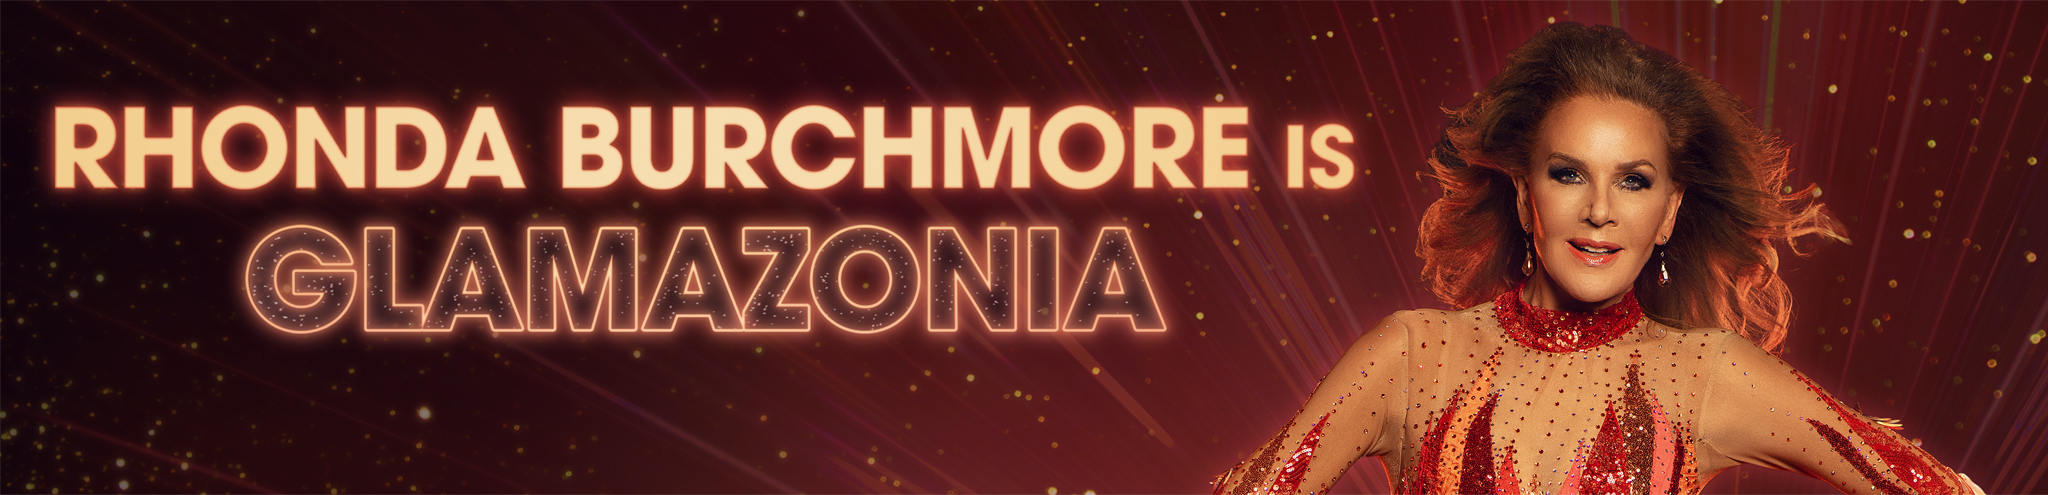 Rhonda Burchmore is Glamazonia